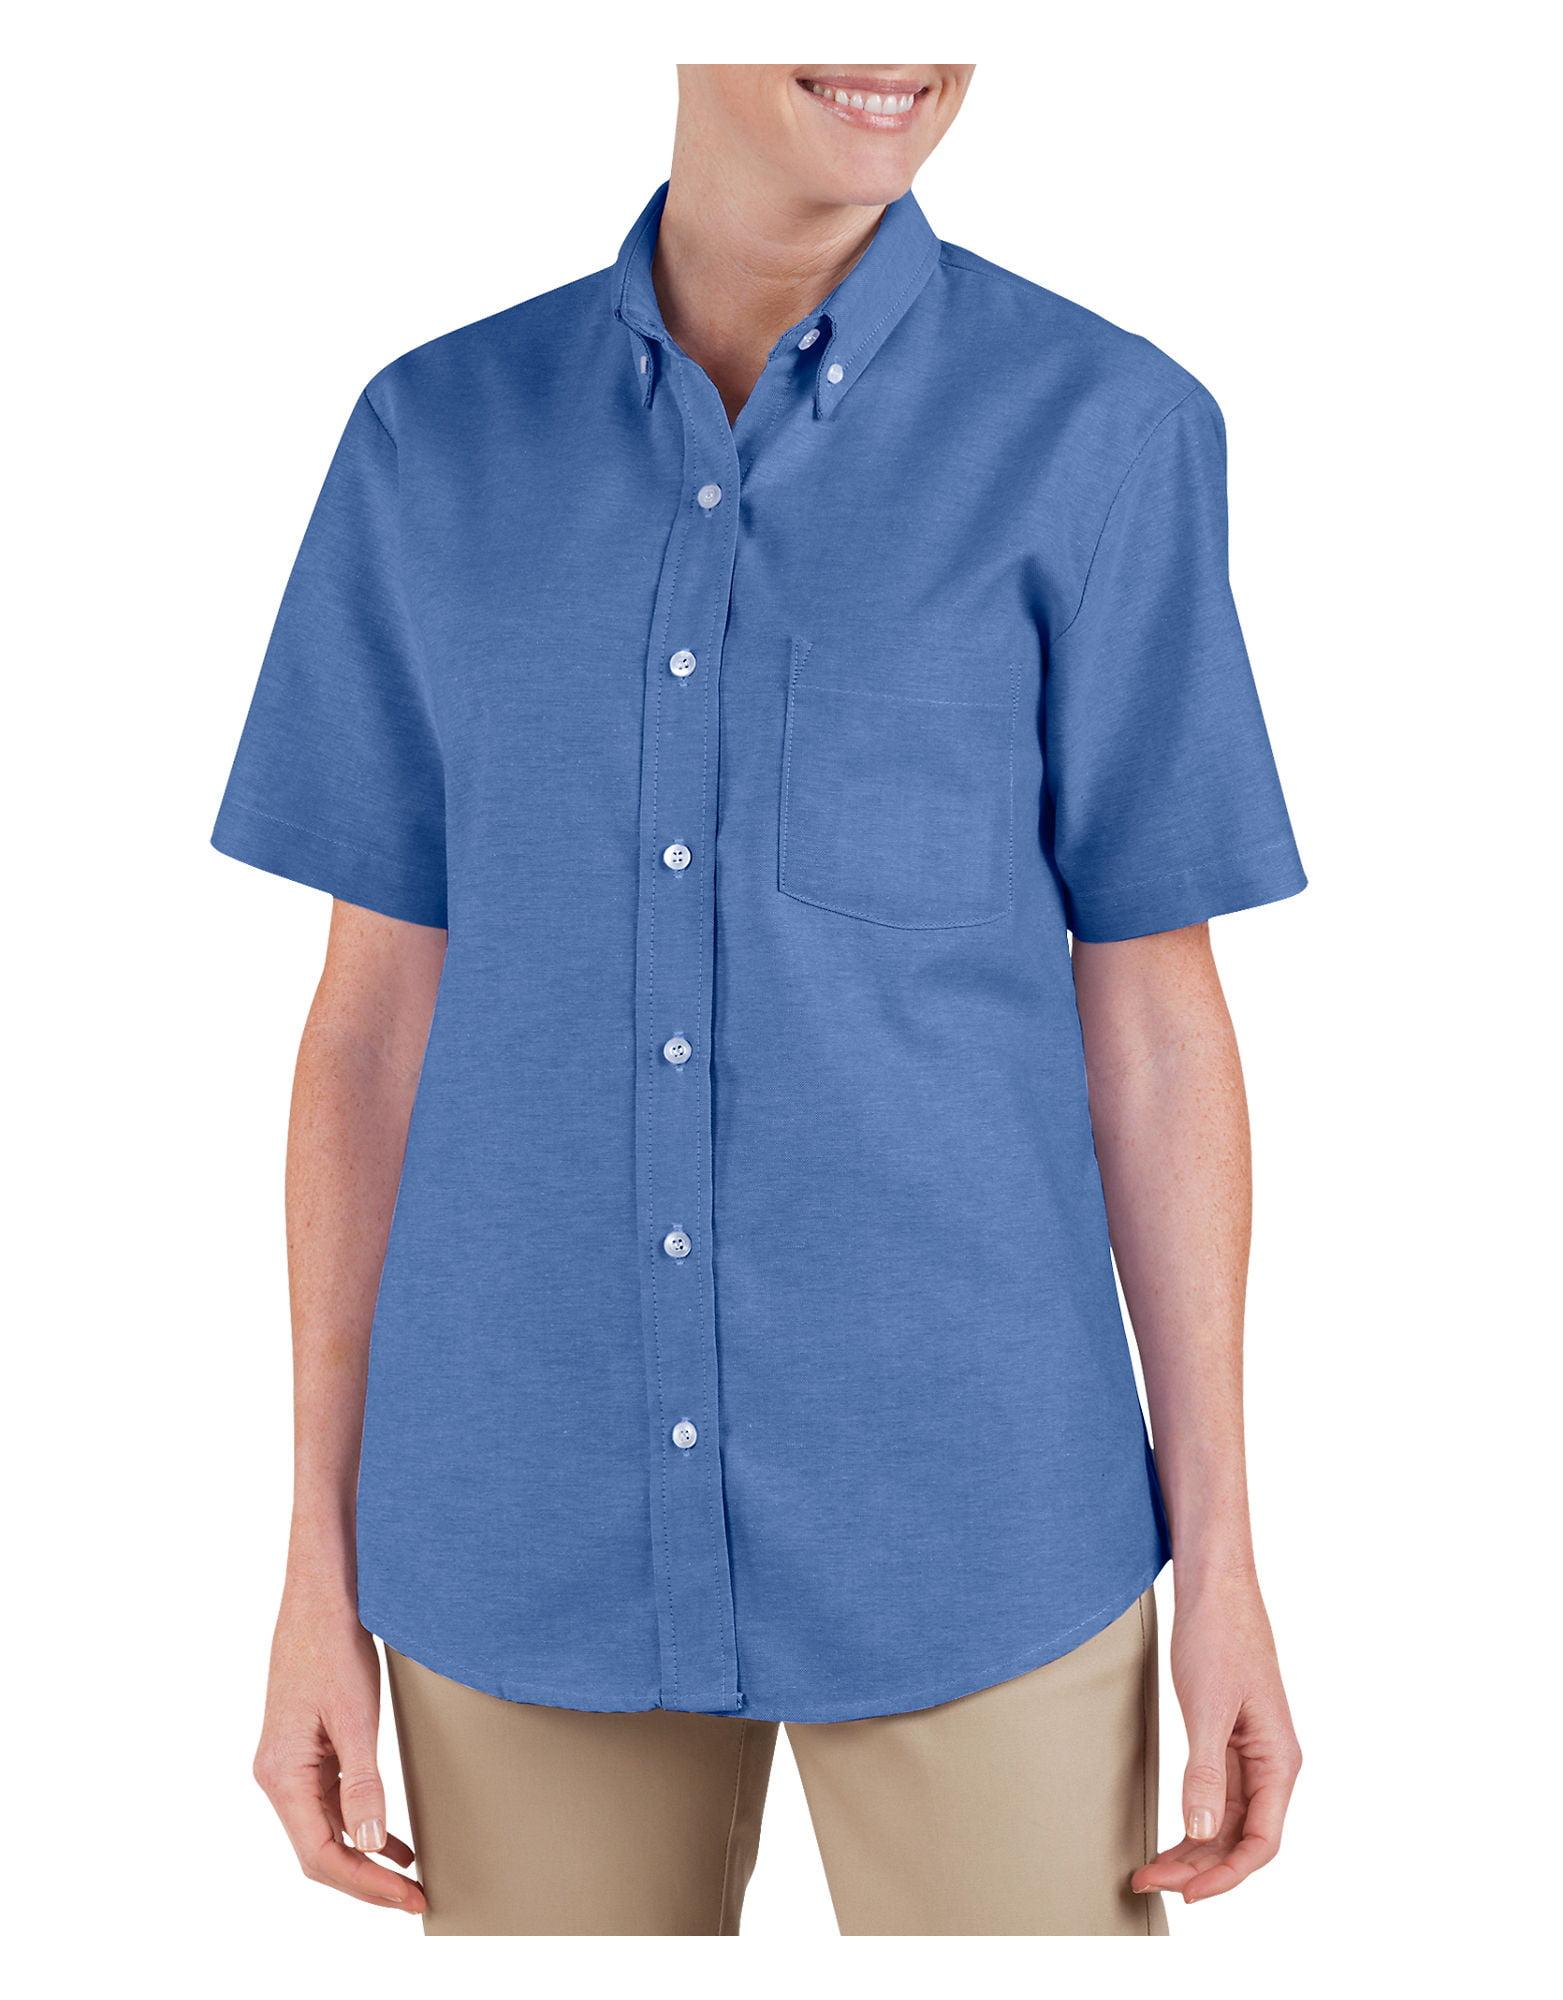 Dickies Womens Button-Down Oxford Shirt - Short Sleeve - Walmart.com